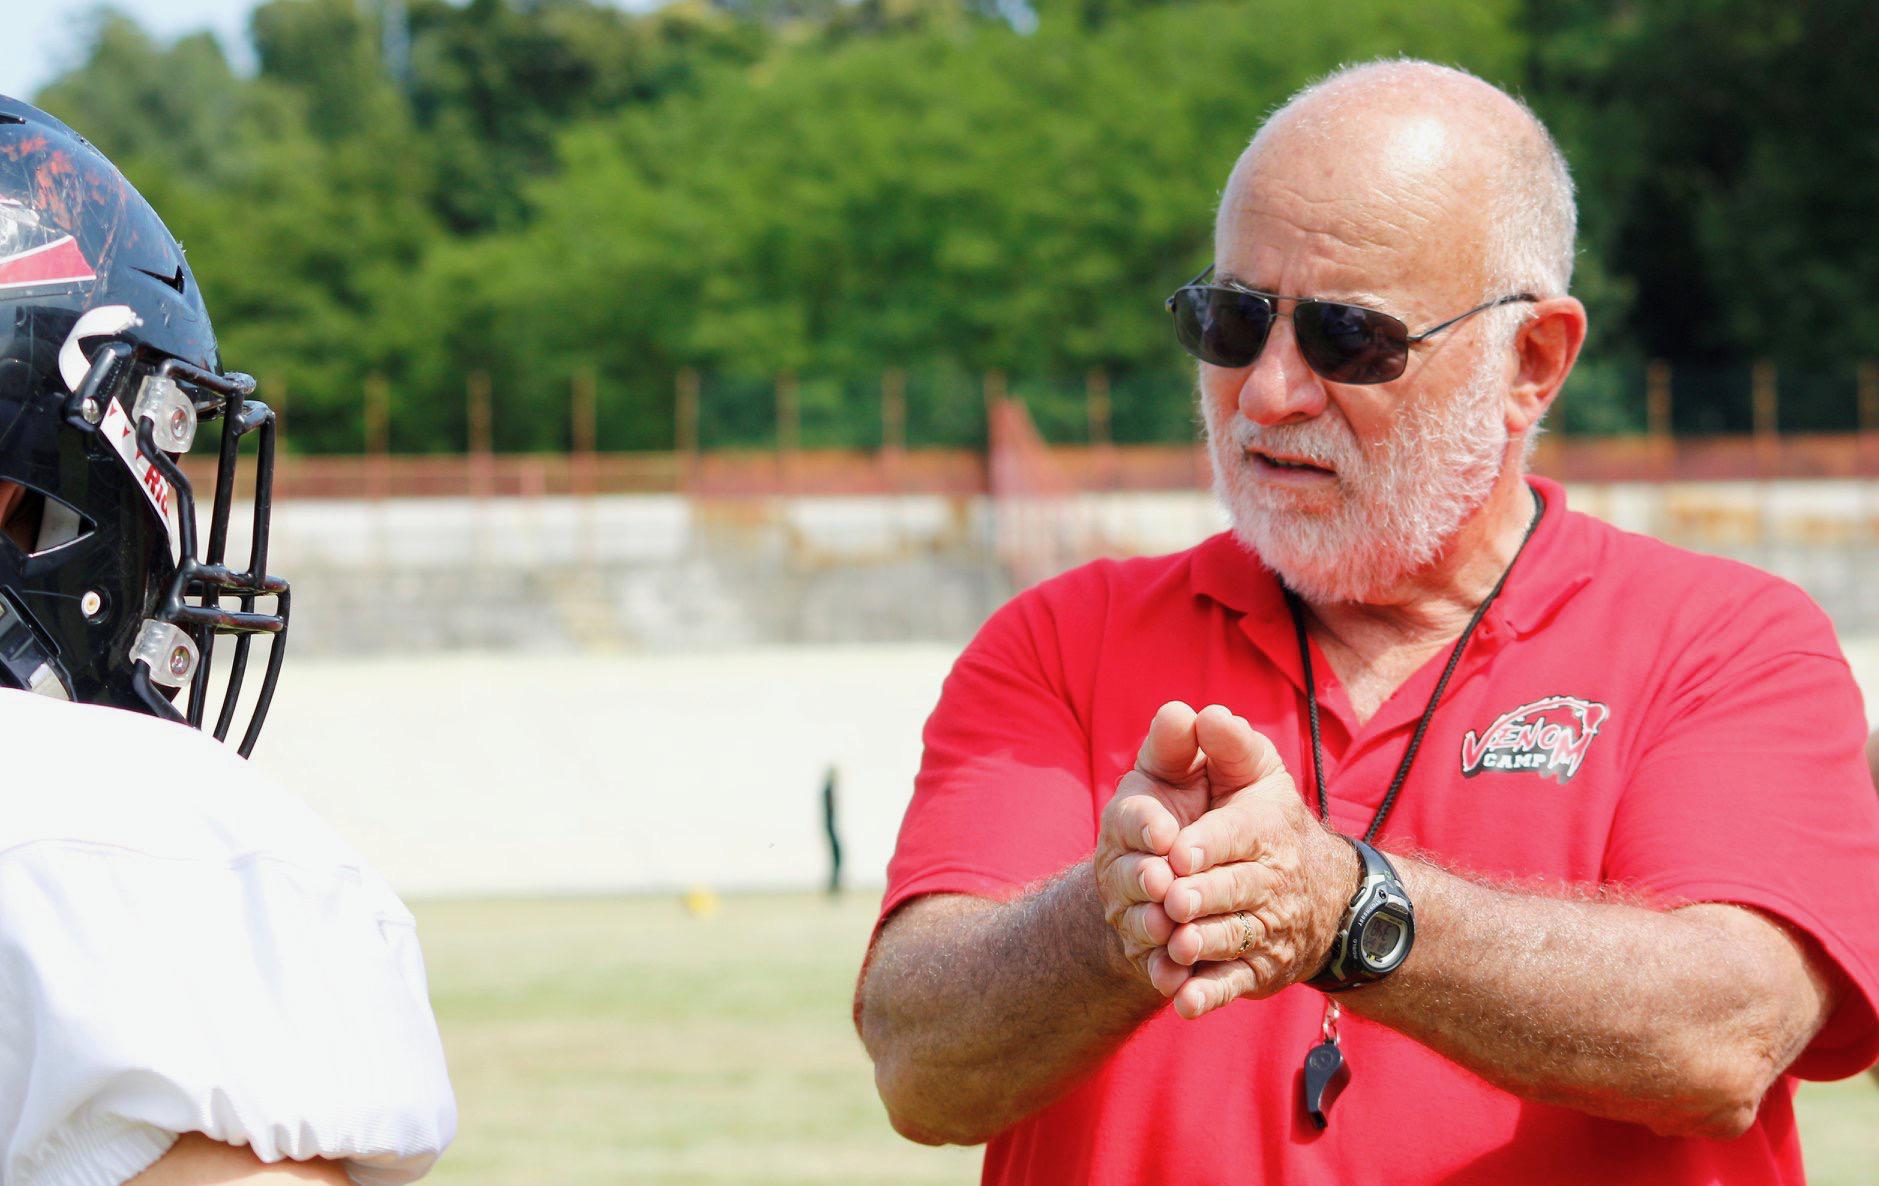 Ventura County football coach in Italy in lockdown